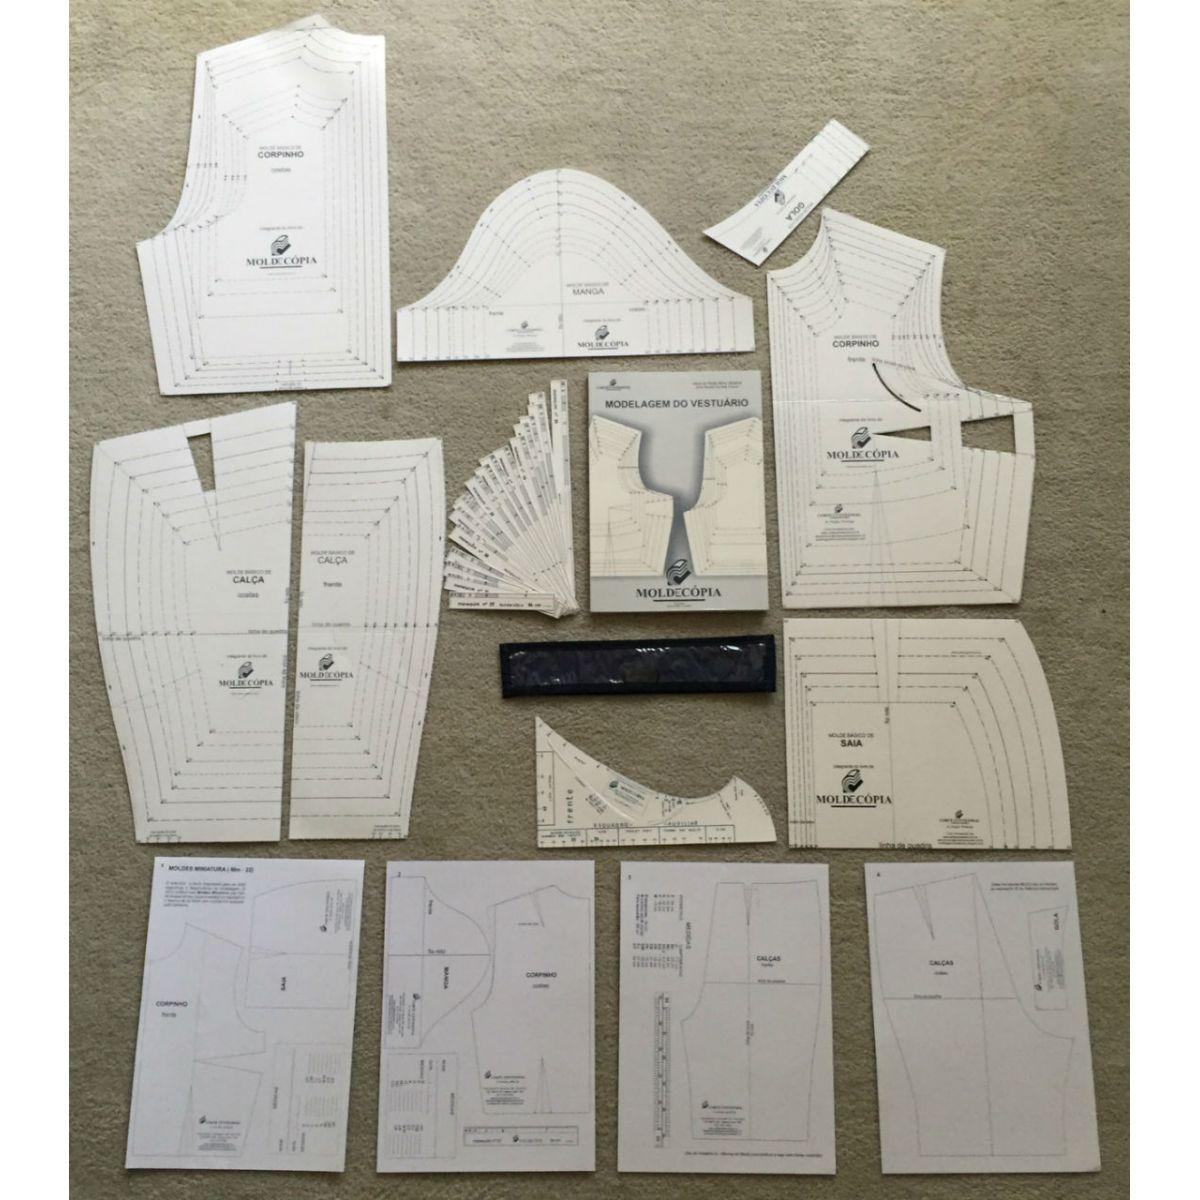 Sistema Moldecópia 7 kits  - Corte Centesimal